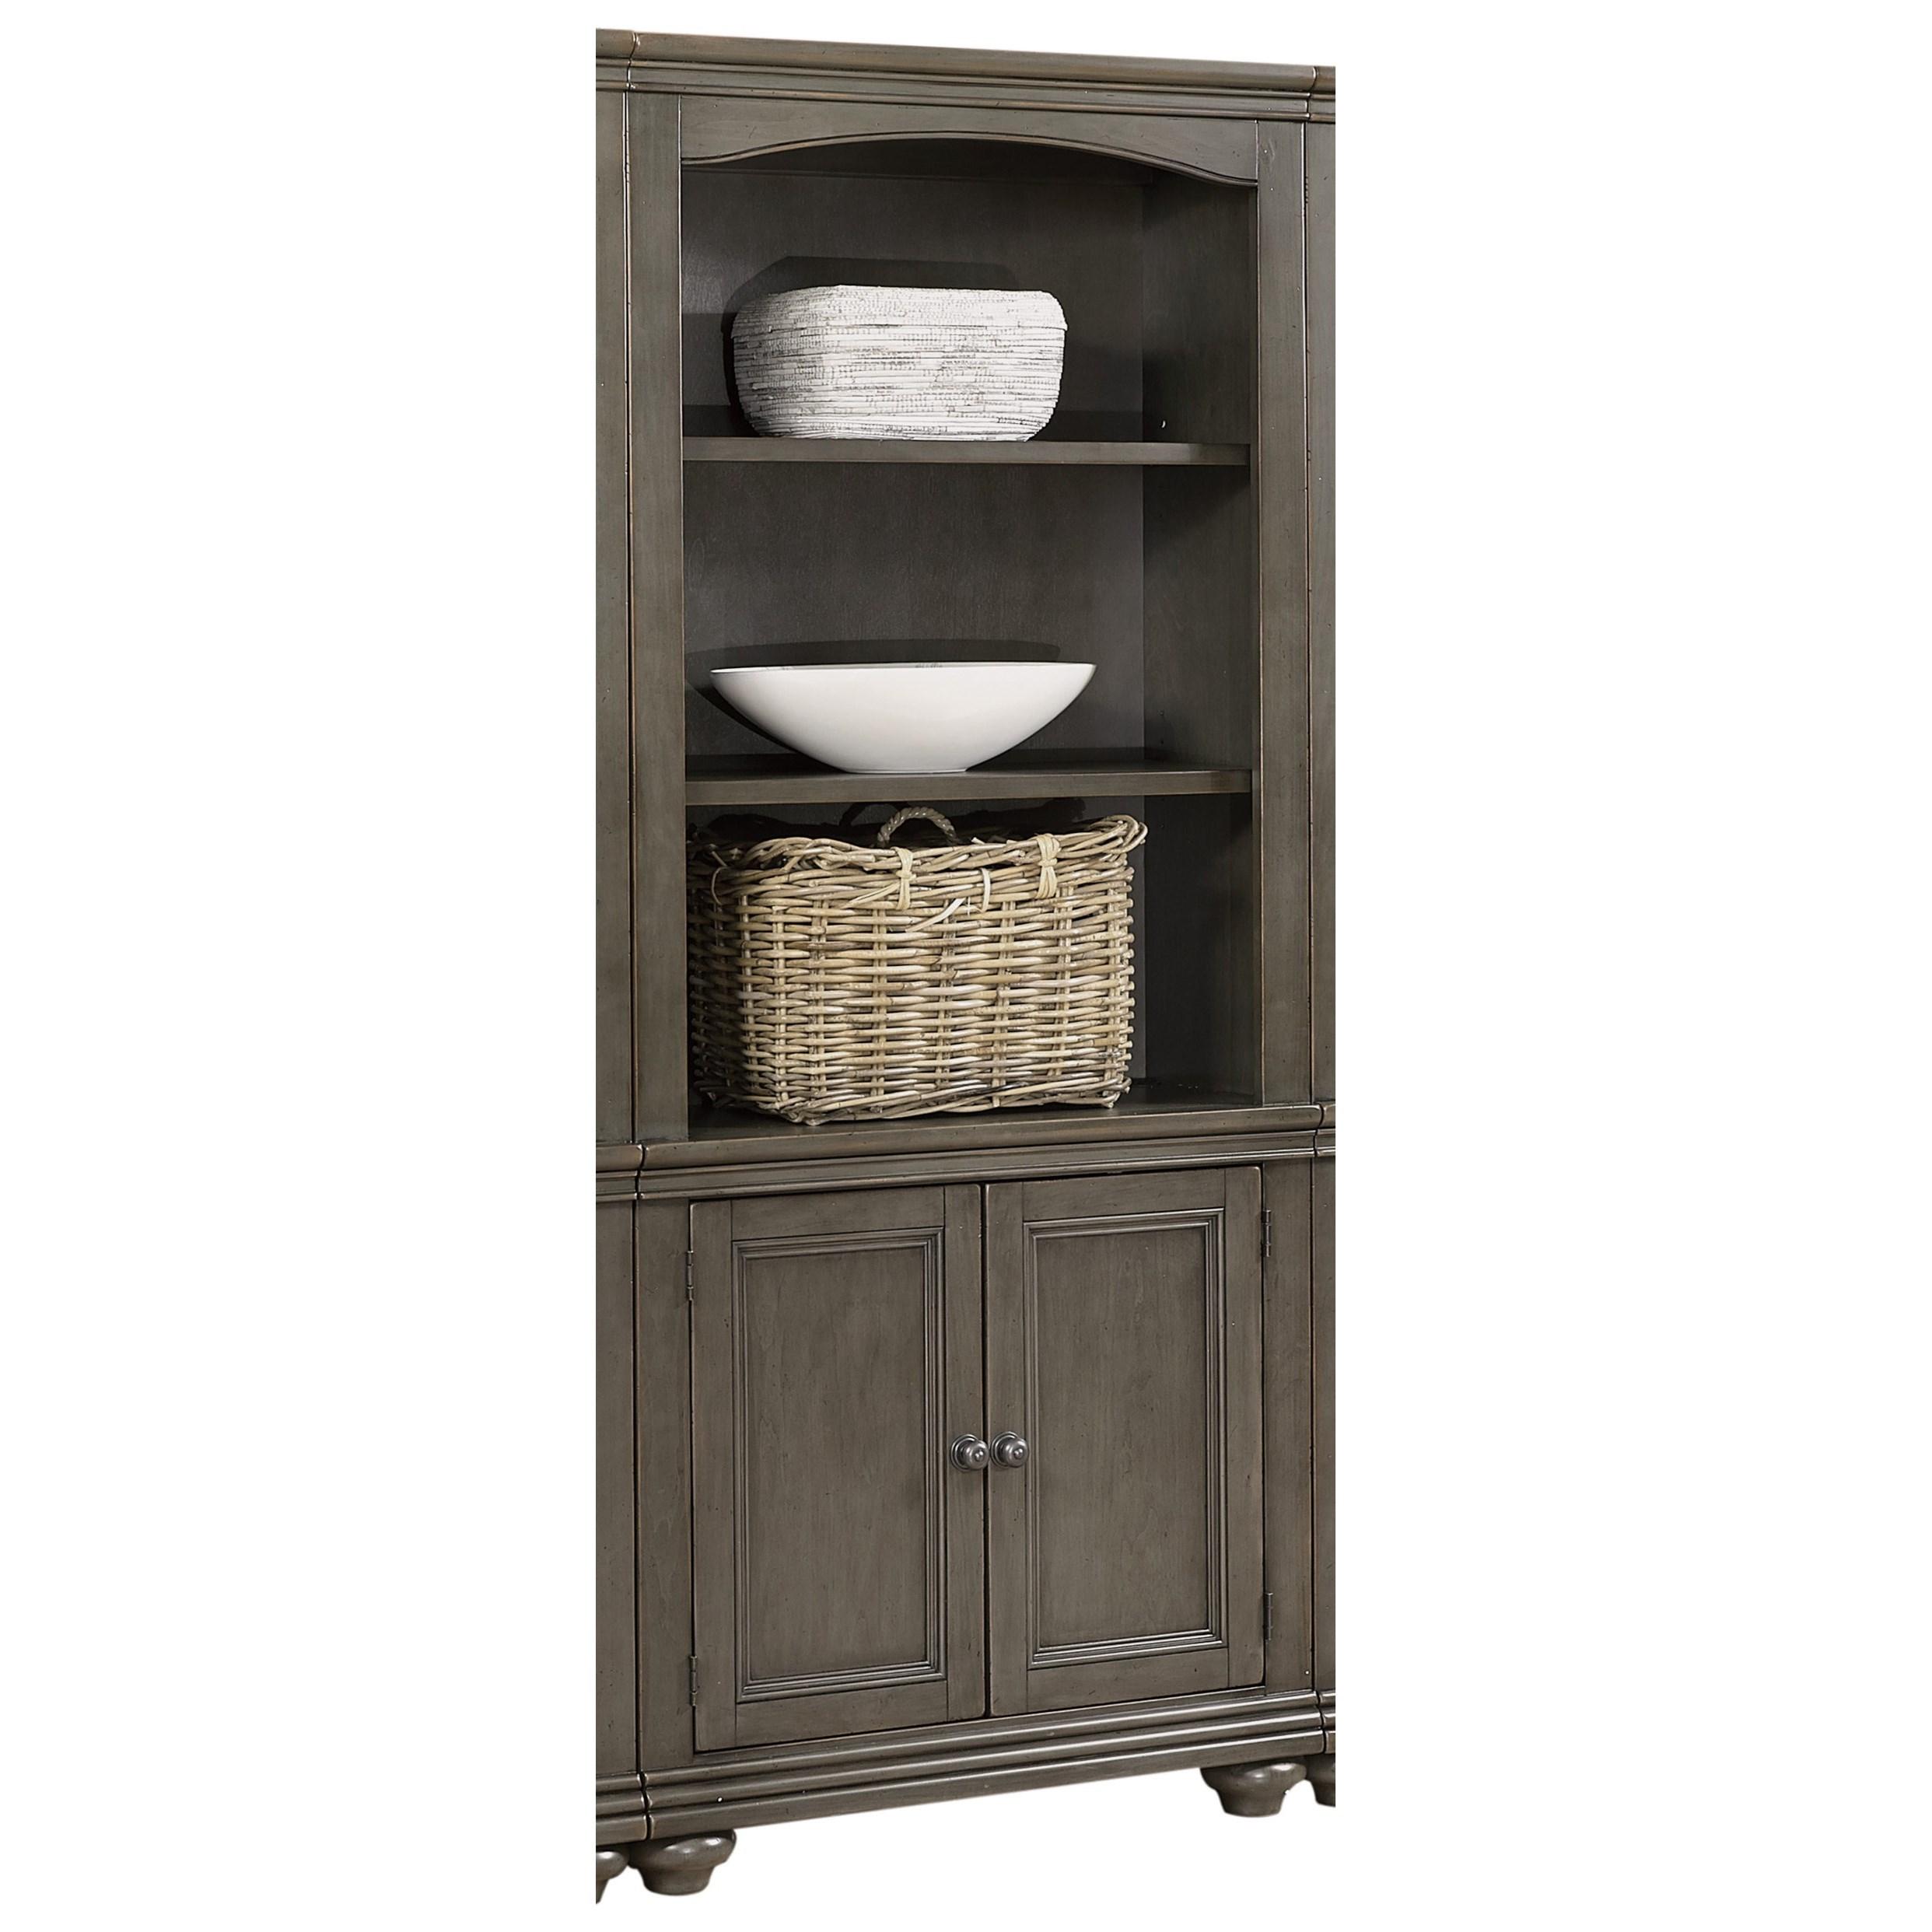 Birch Home Oxford Door Bookcase With Adjustable Shelves